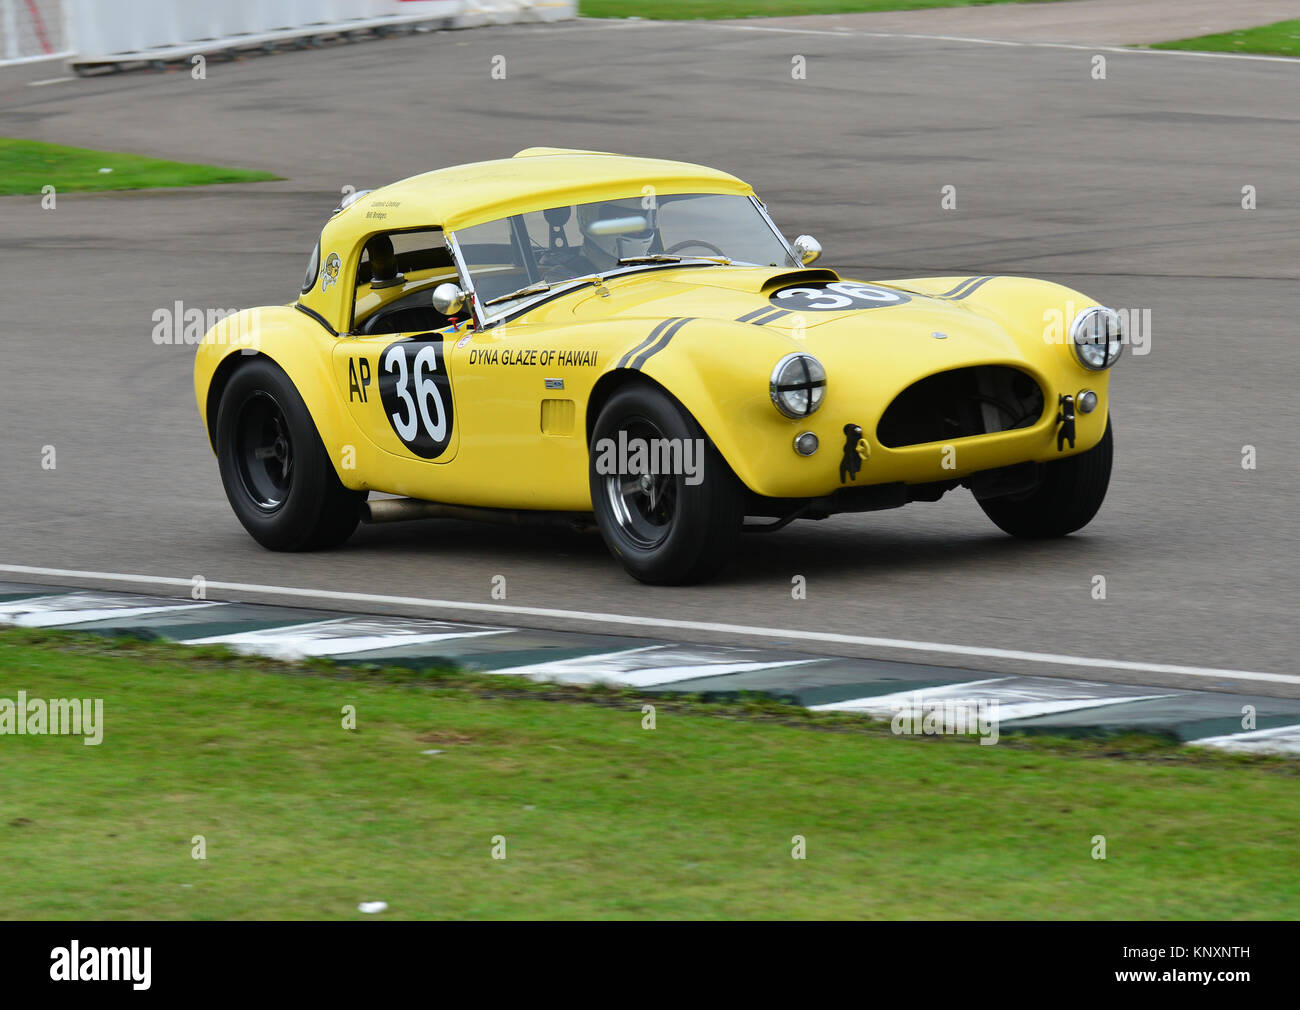 Hairy Canary, Bill Bridges, Ludovic Lindsay, AC Cobra. Royal Automobile Club TT Celebration, Goodwood Revival 2013 - Stock Image